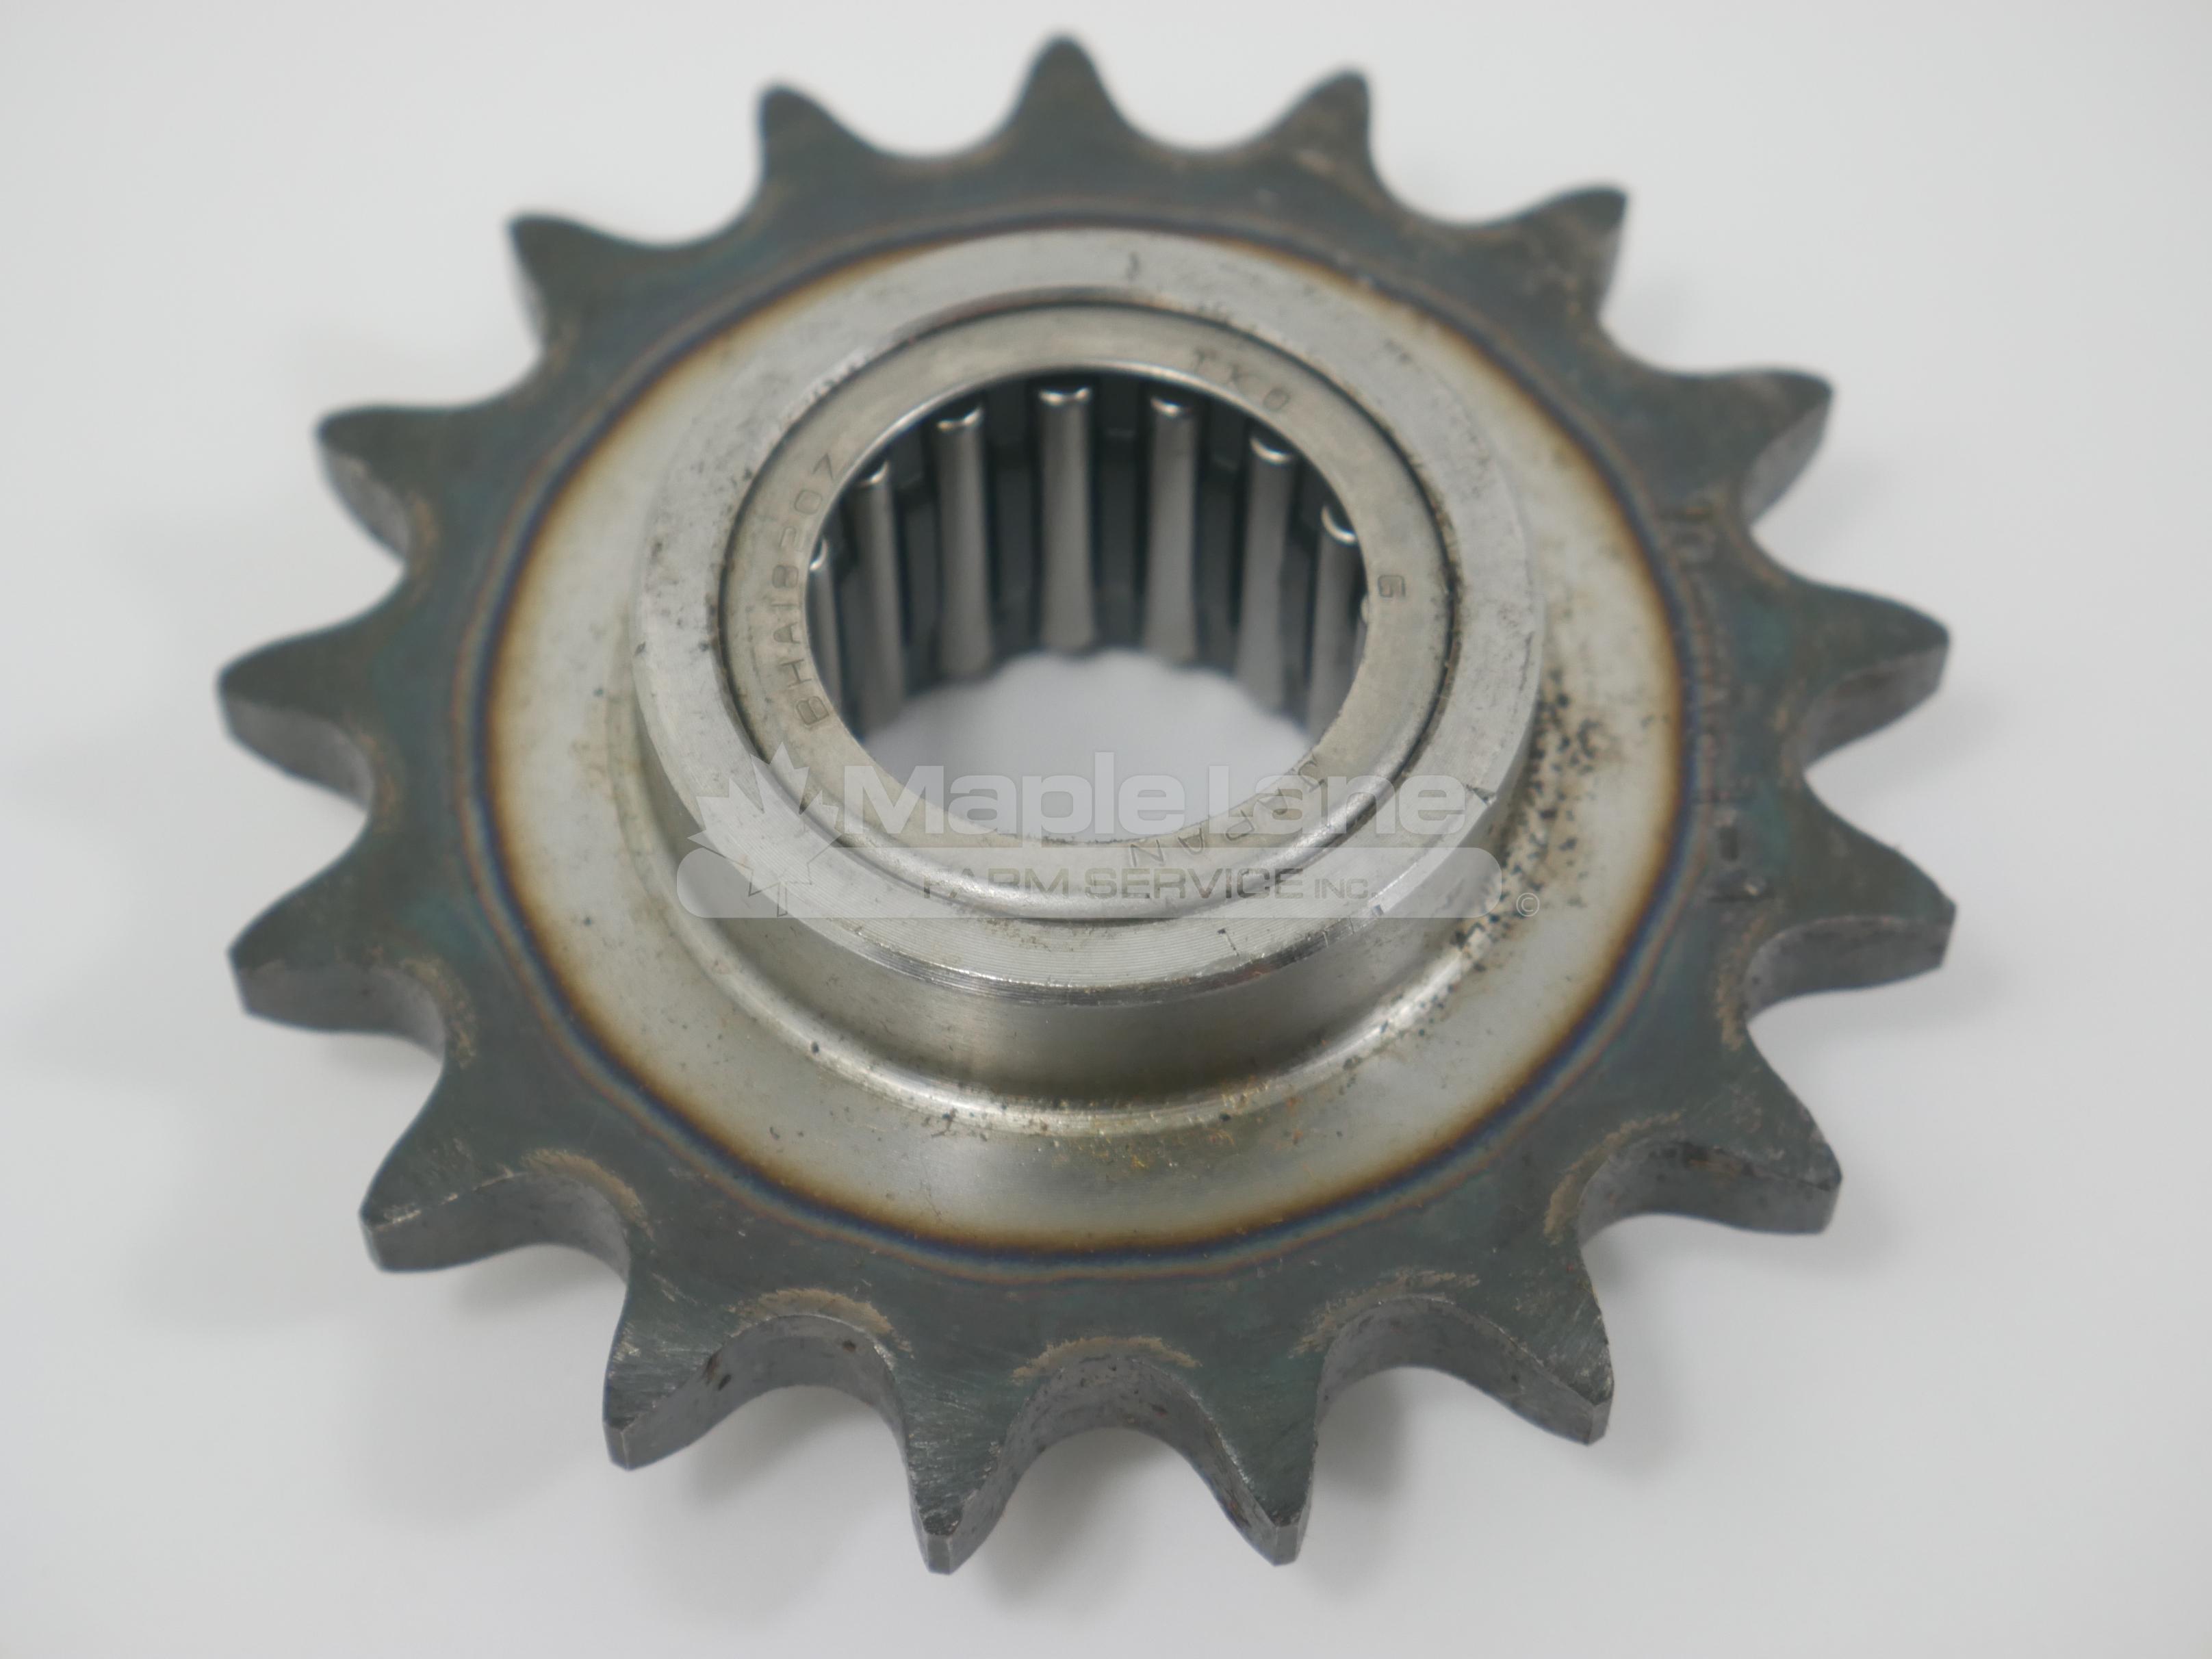 10-0061 Sprocket with Bearing